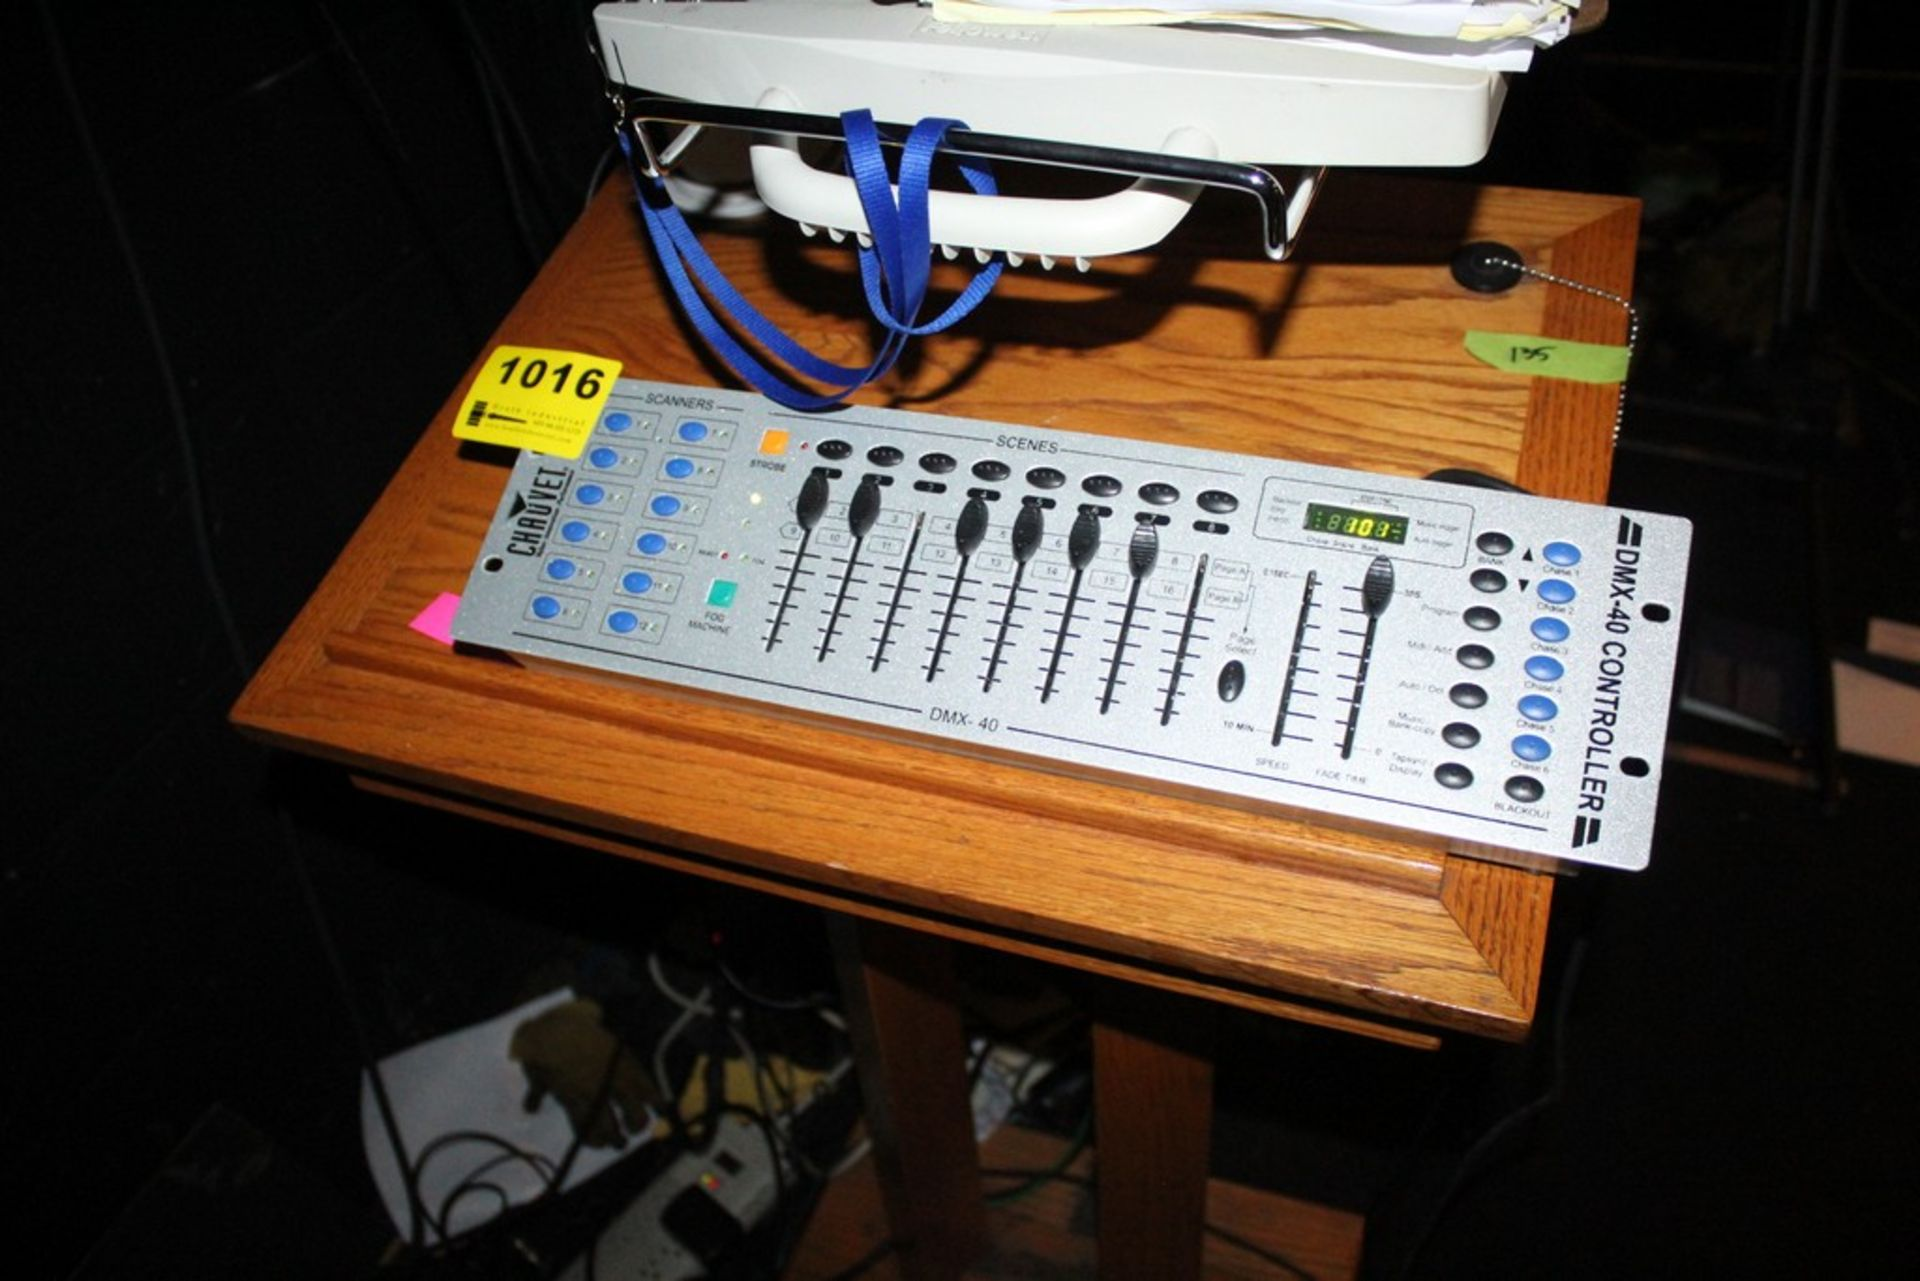 Lot 1016 - CHAUVET MODEL DMX 40 LIGHT CONTROLLER